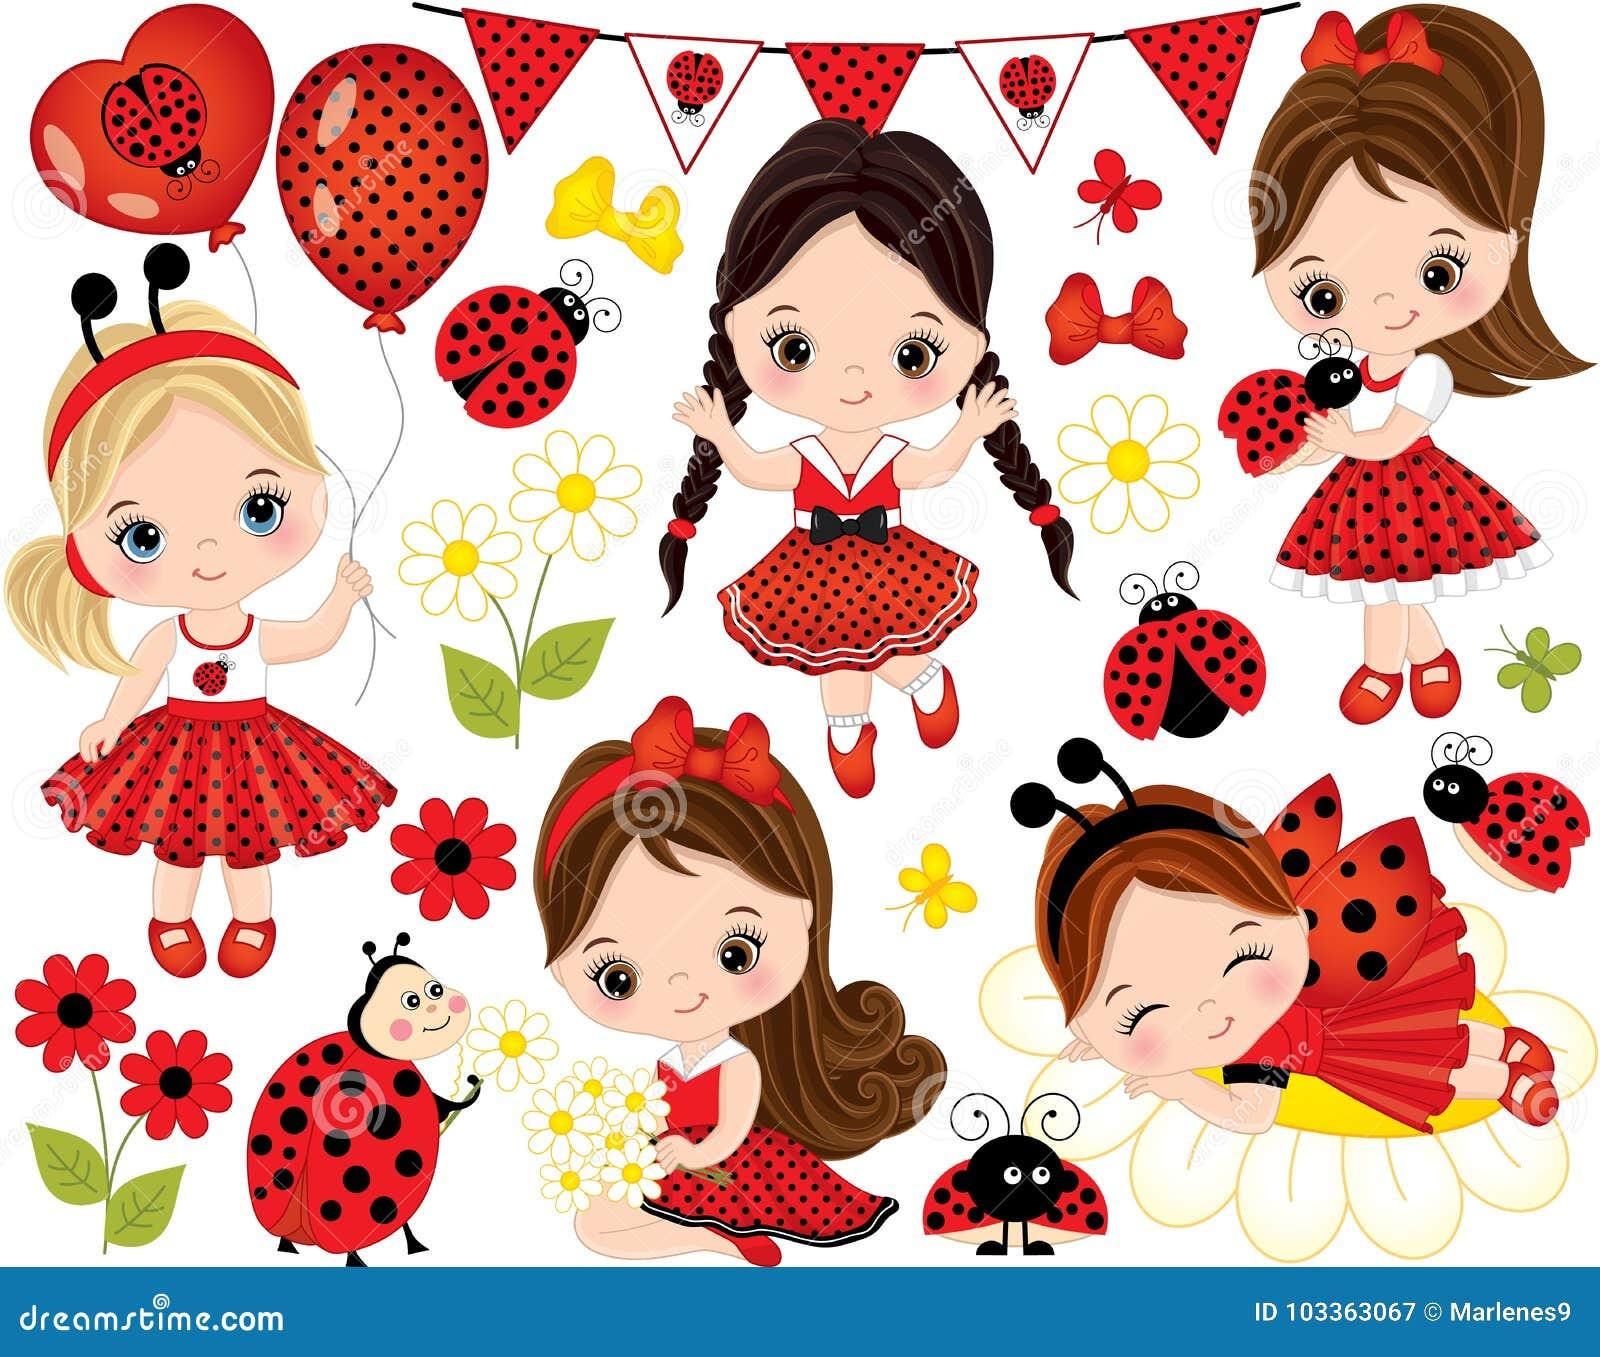 bd04b2c904e Διάνυσμα που τίθεται με τα χαριτωμένα μικρά κορίτσια, Ladybugs και τα  λουλούδια